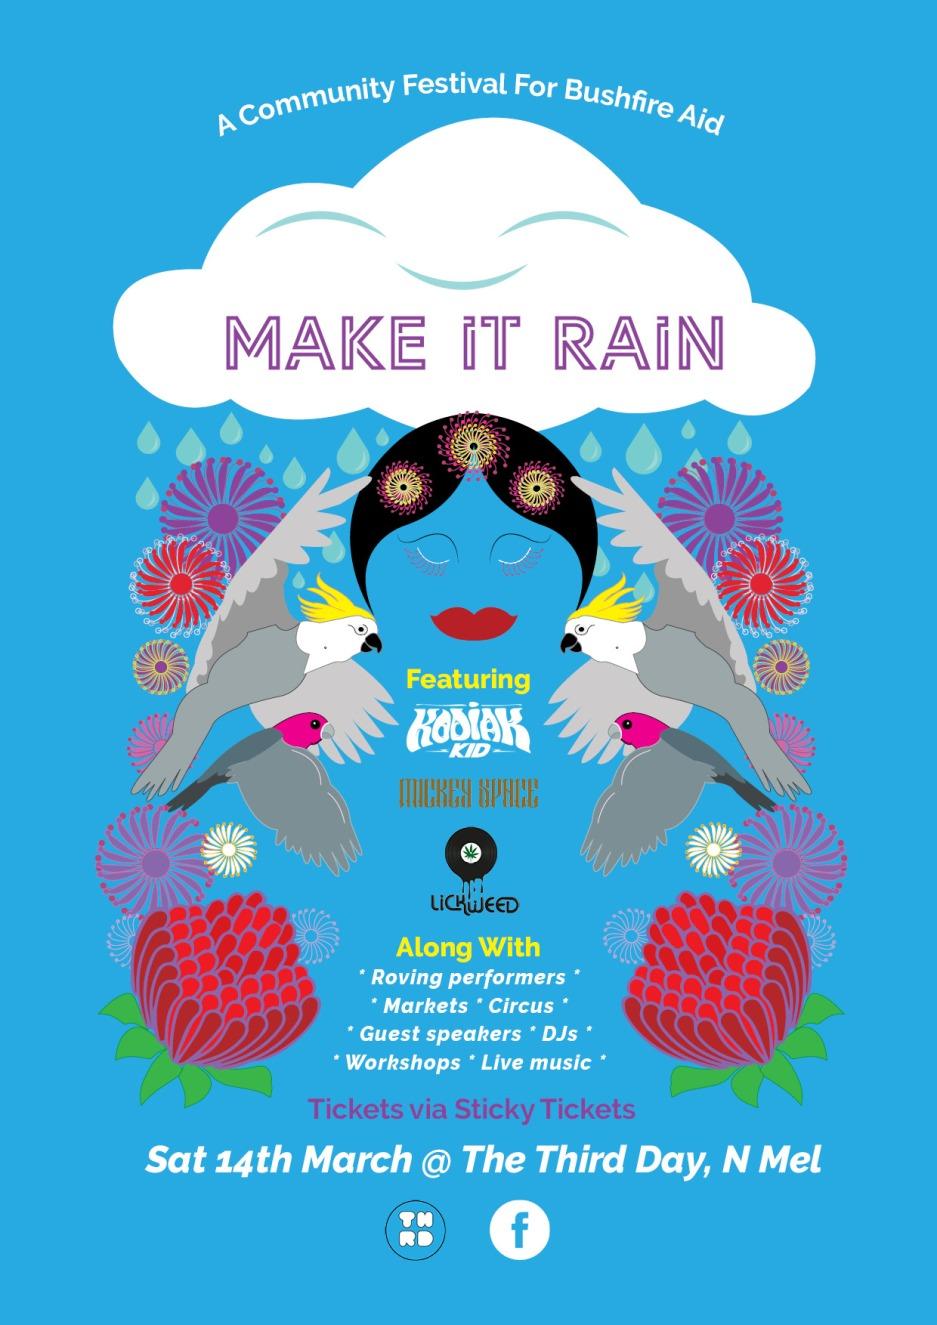 make it rain postering a4